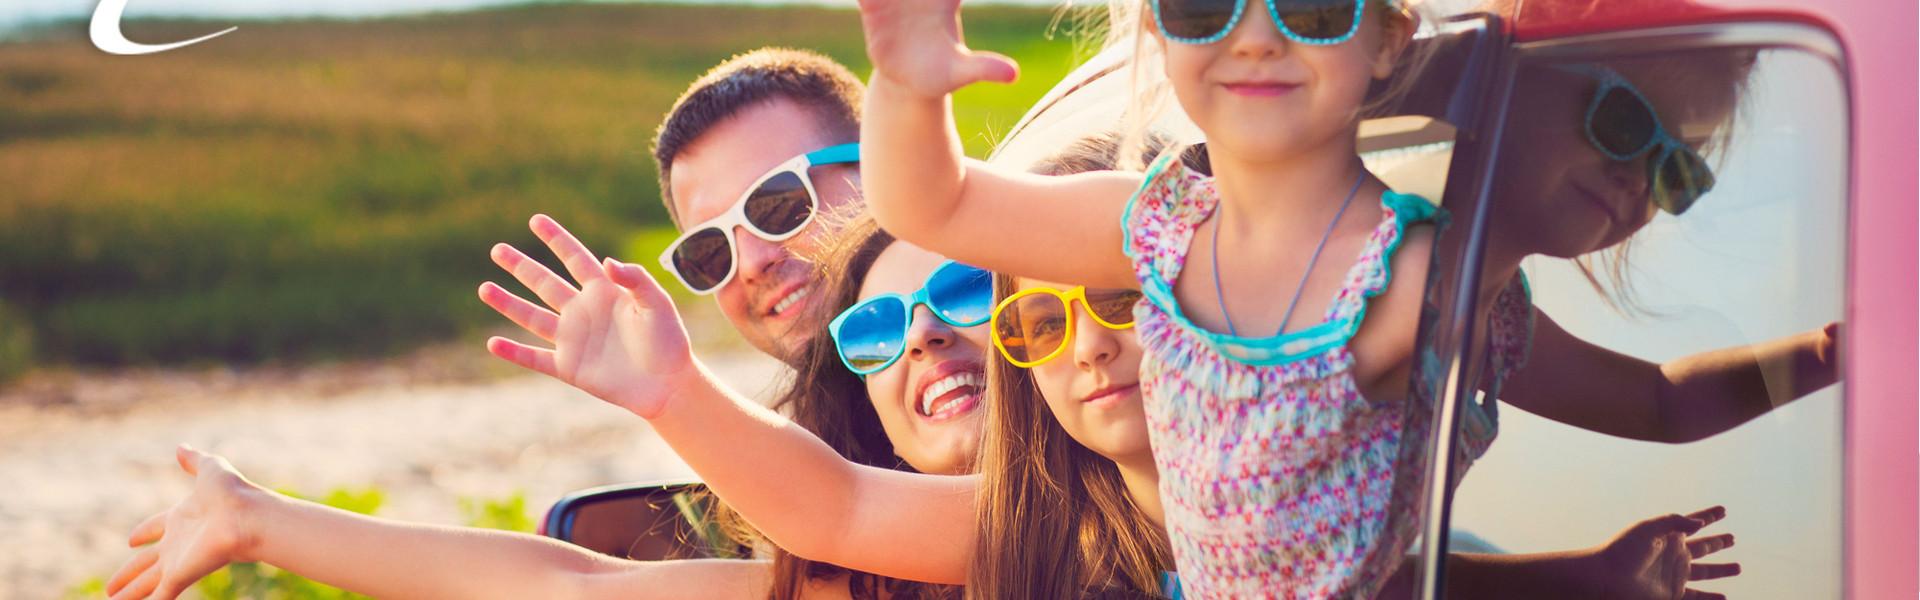 Kids Having Fun With AAA Hotel Discounts | Westgate Palace Orlando | AAA Hotel Rates Near I Drive, Orlando, FL 32819